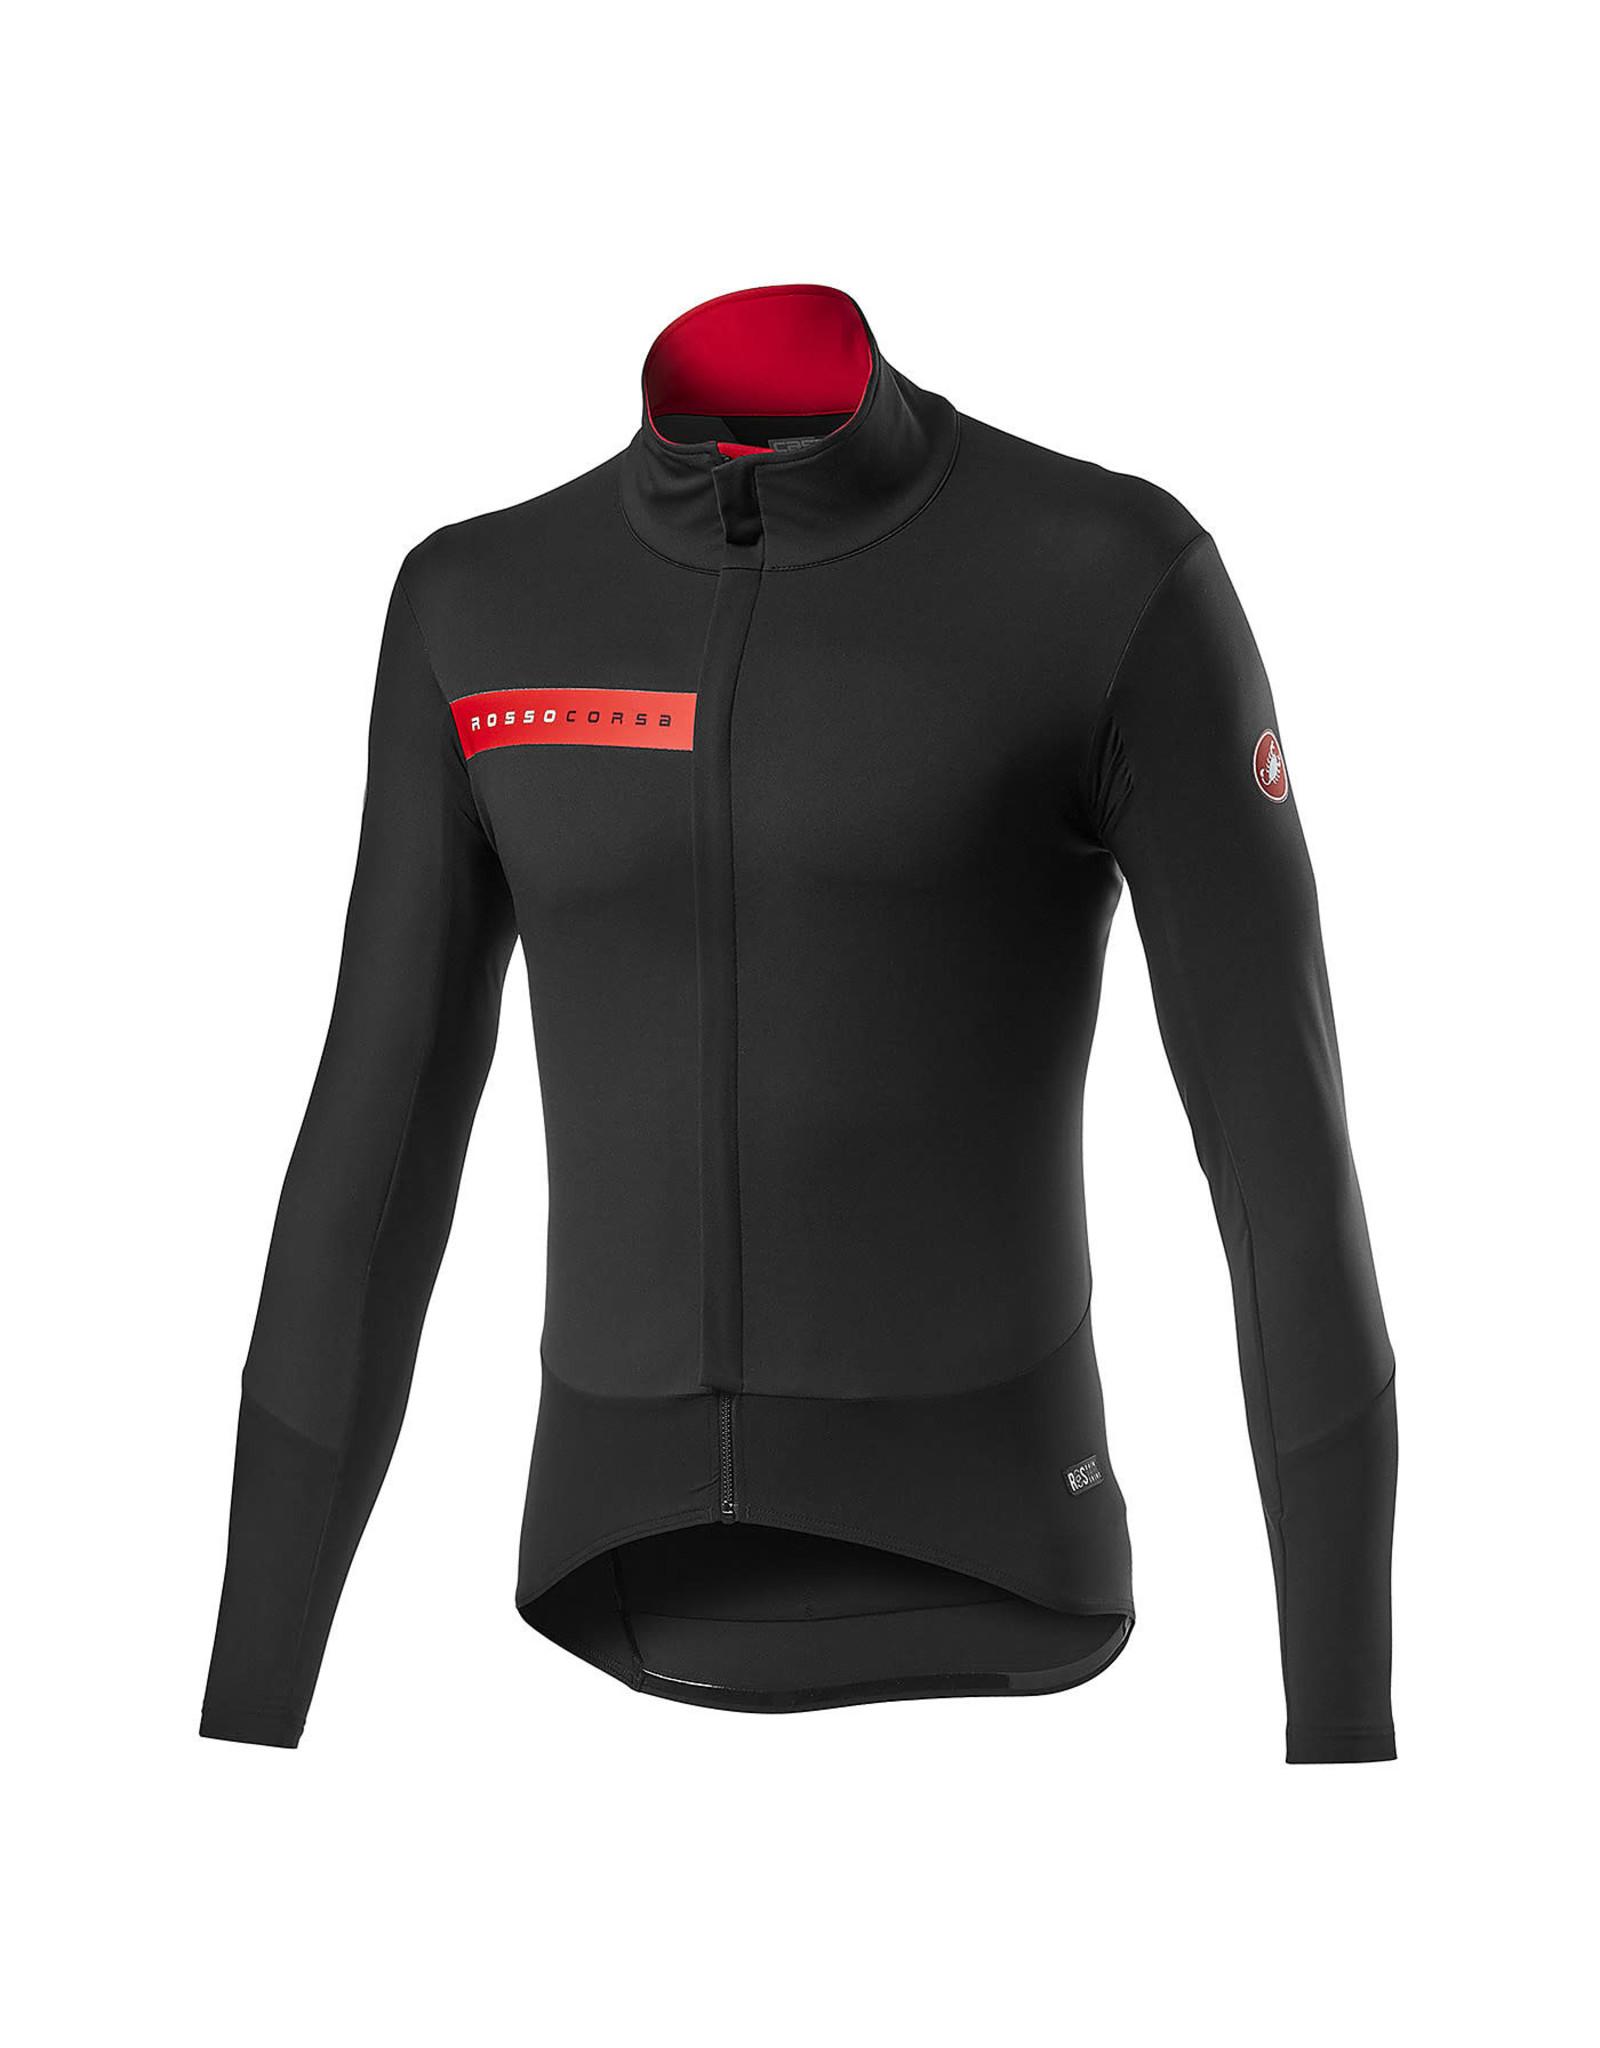 Castelli 21, Castelli, Men's Beta ROS Jacket